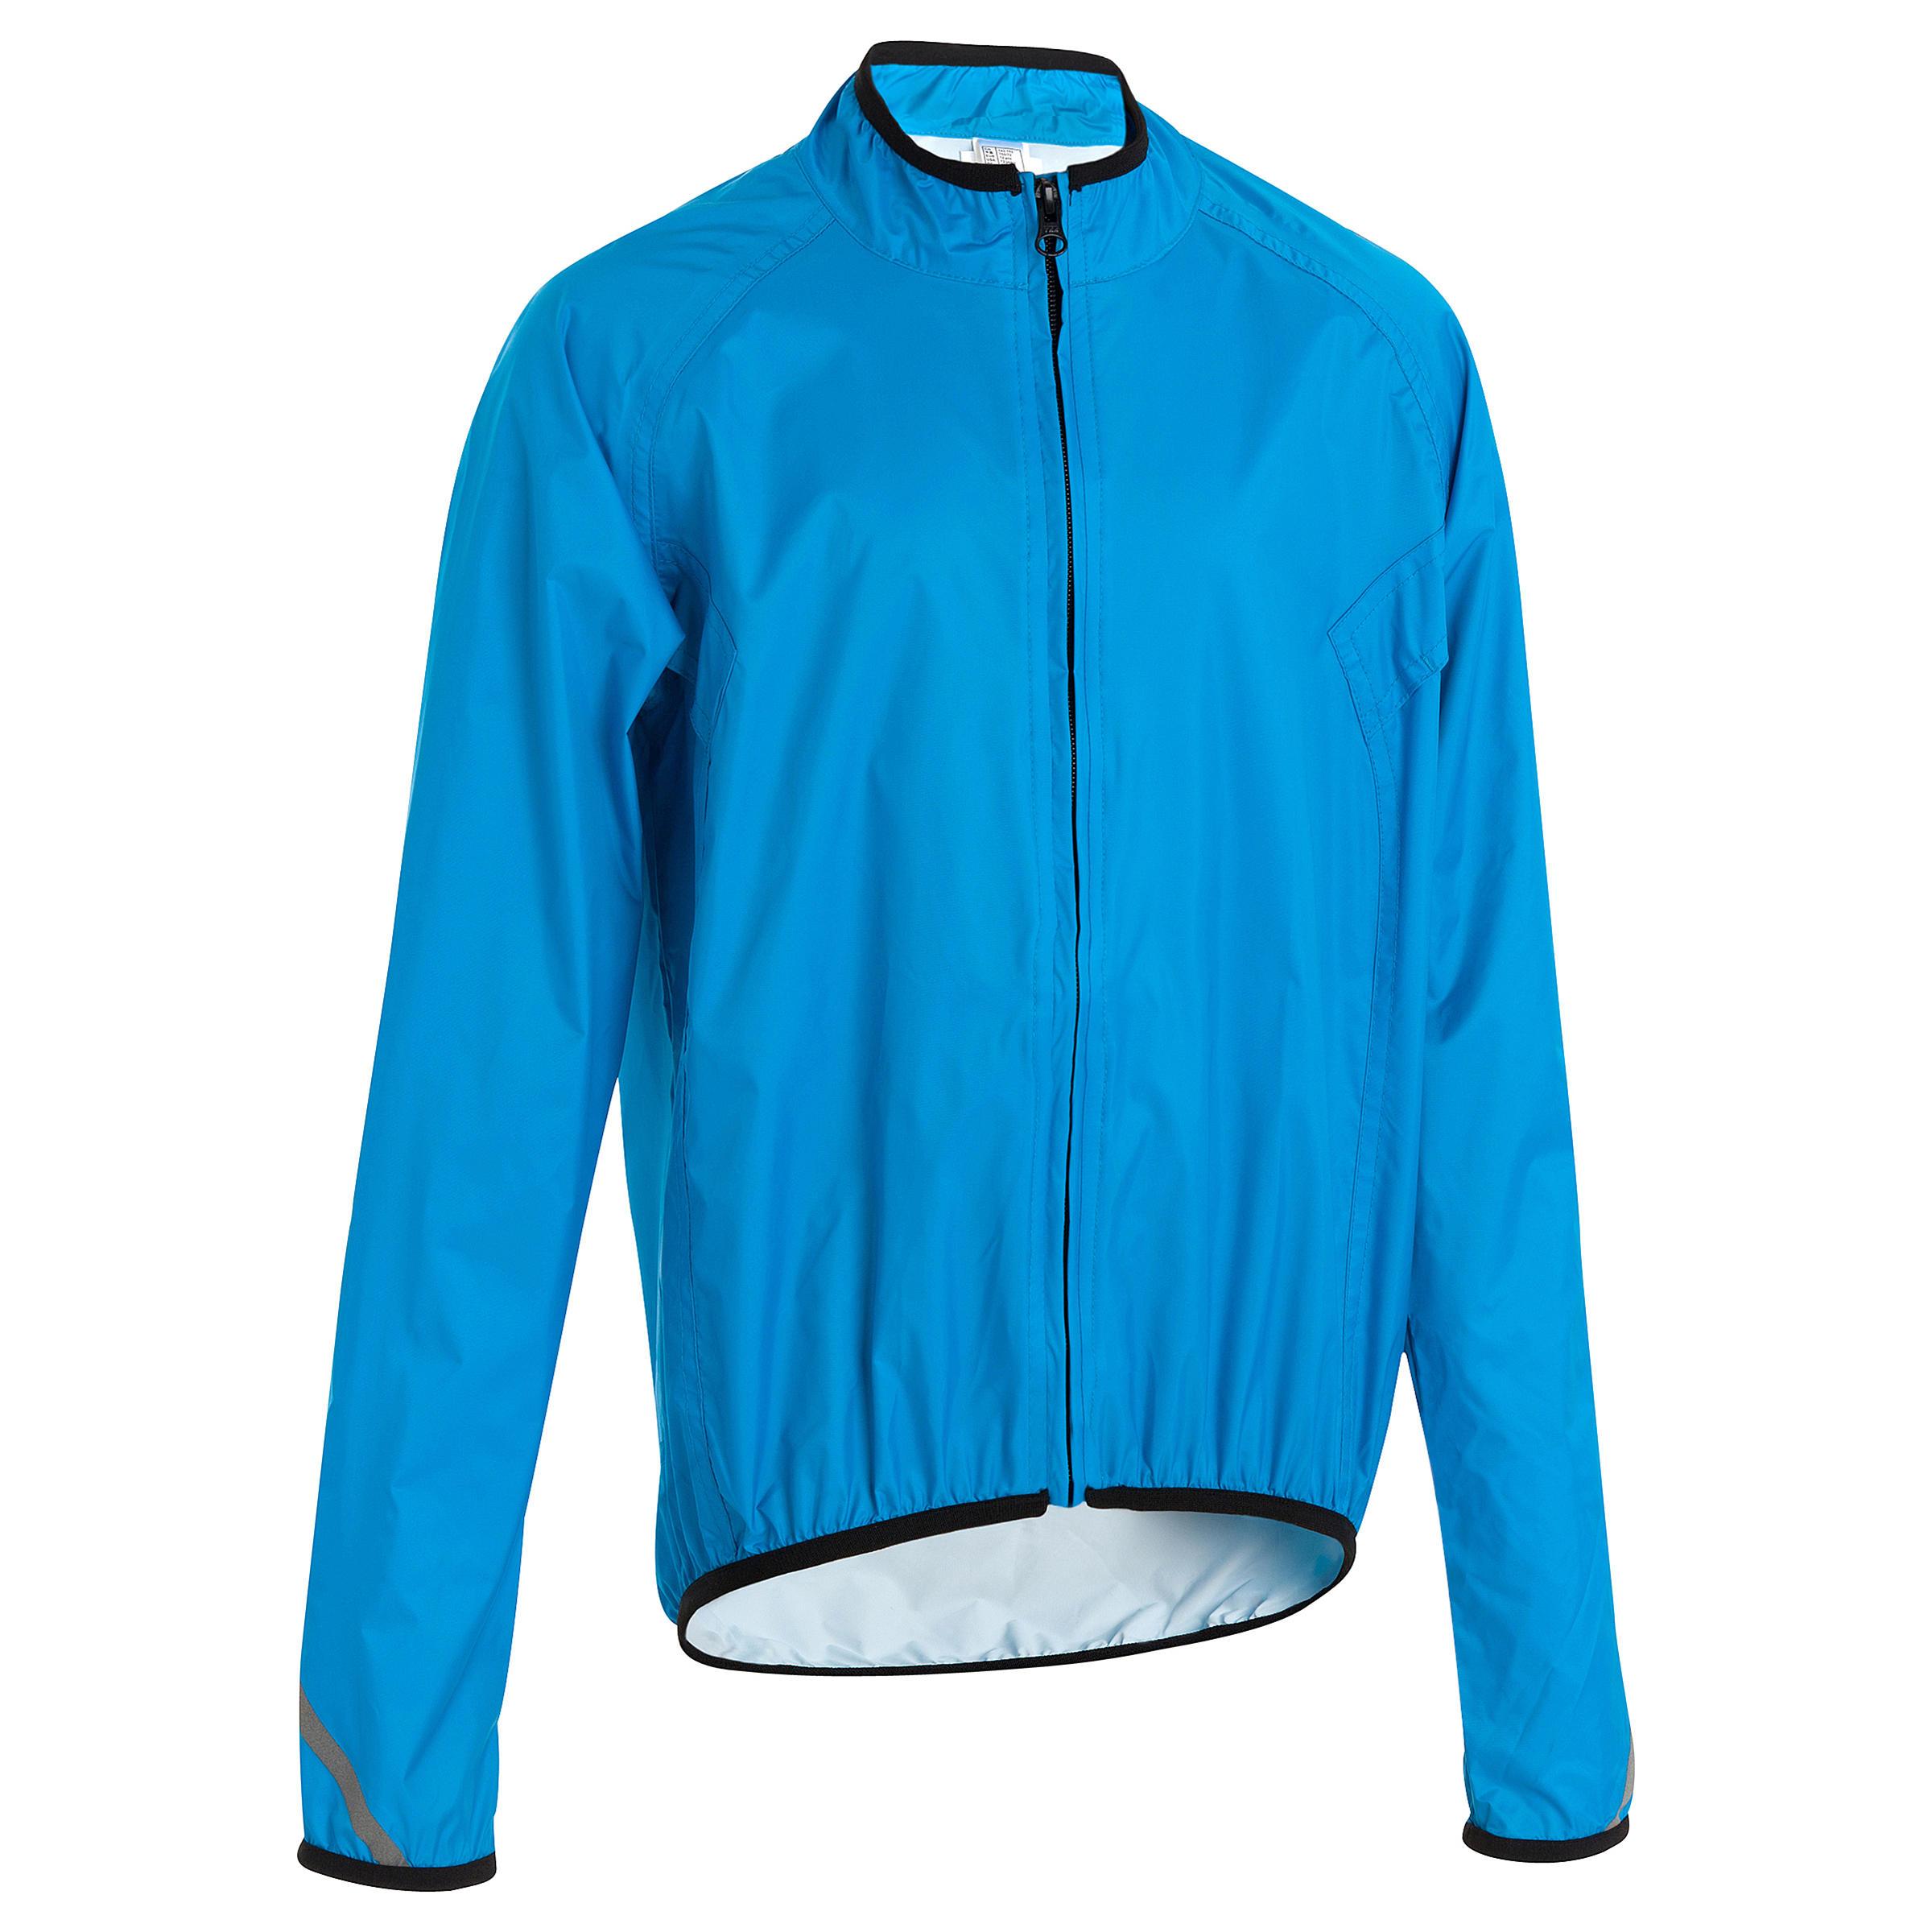 300 Kids' Cycling Waterproof - Blue